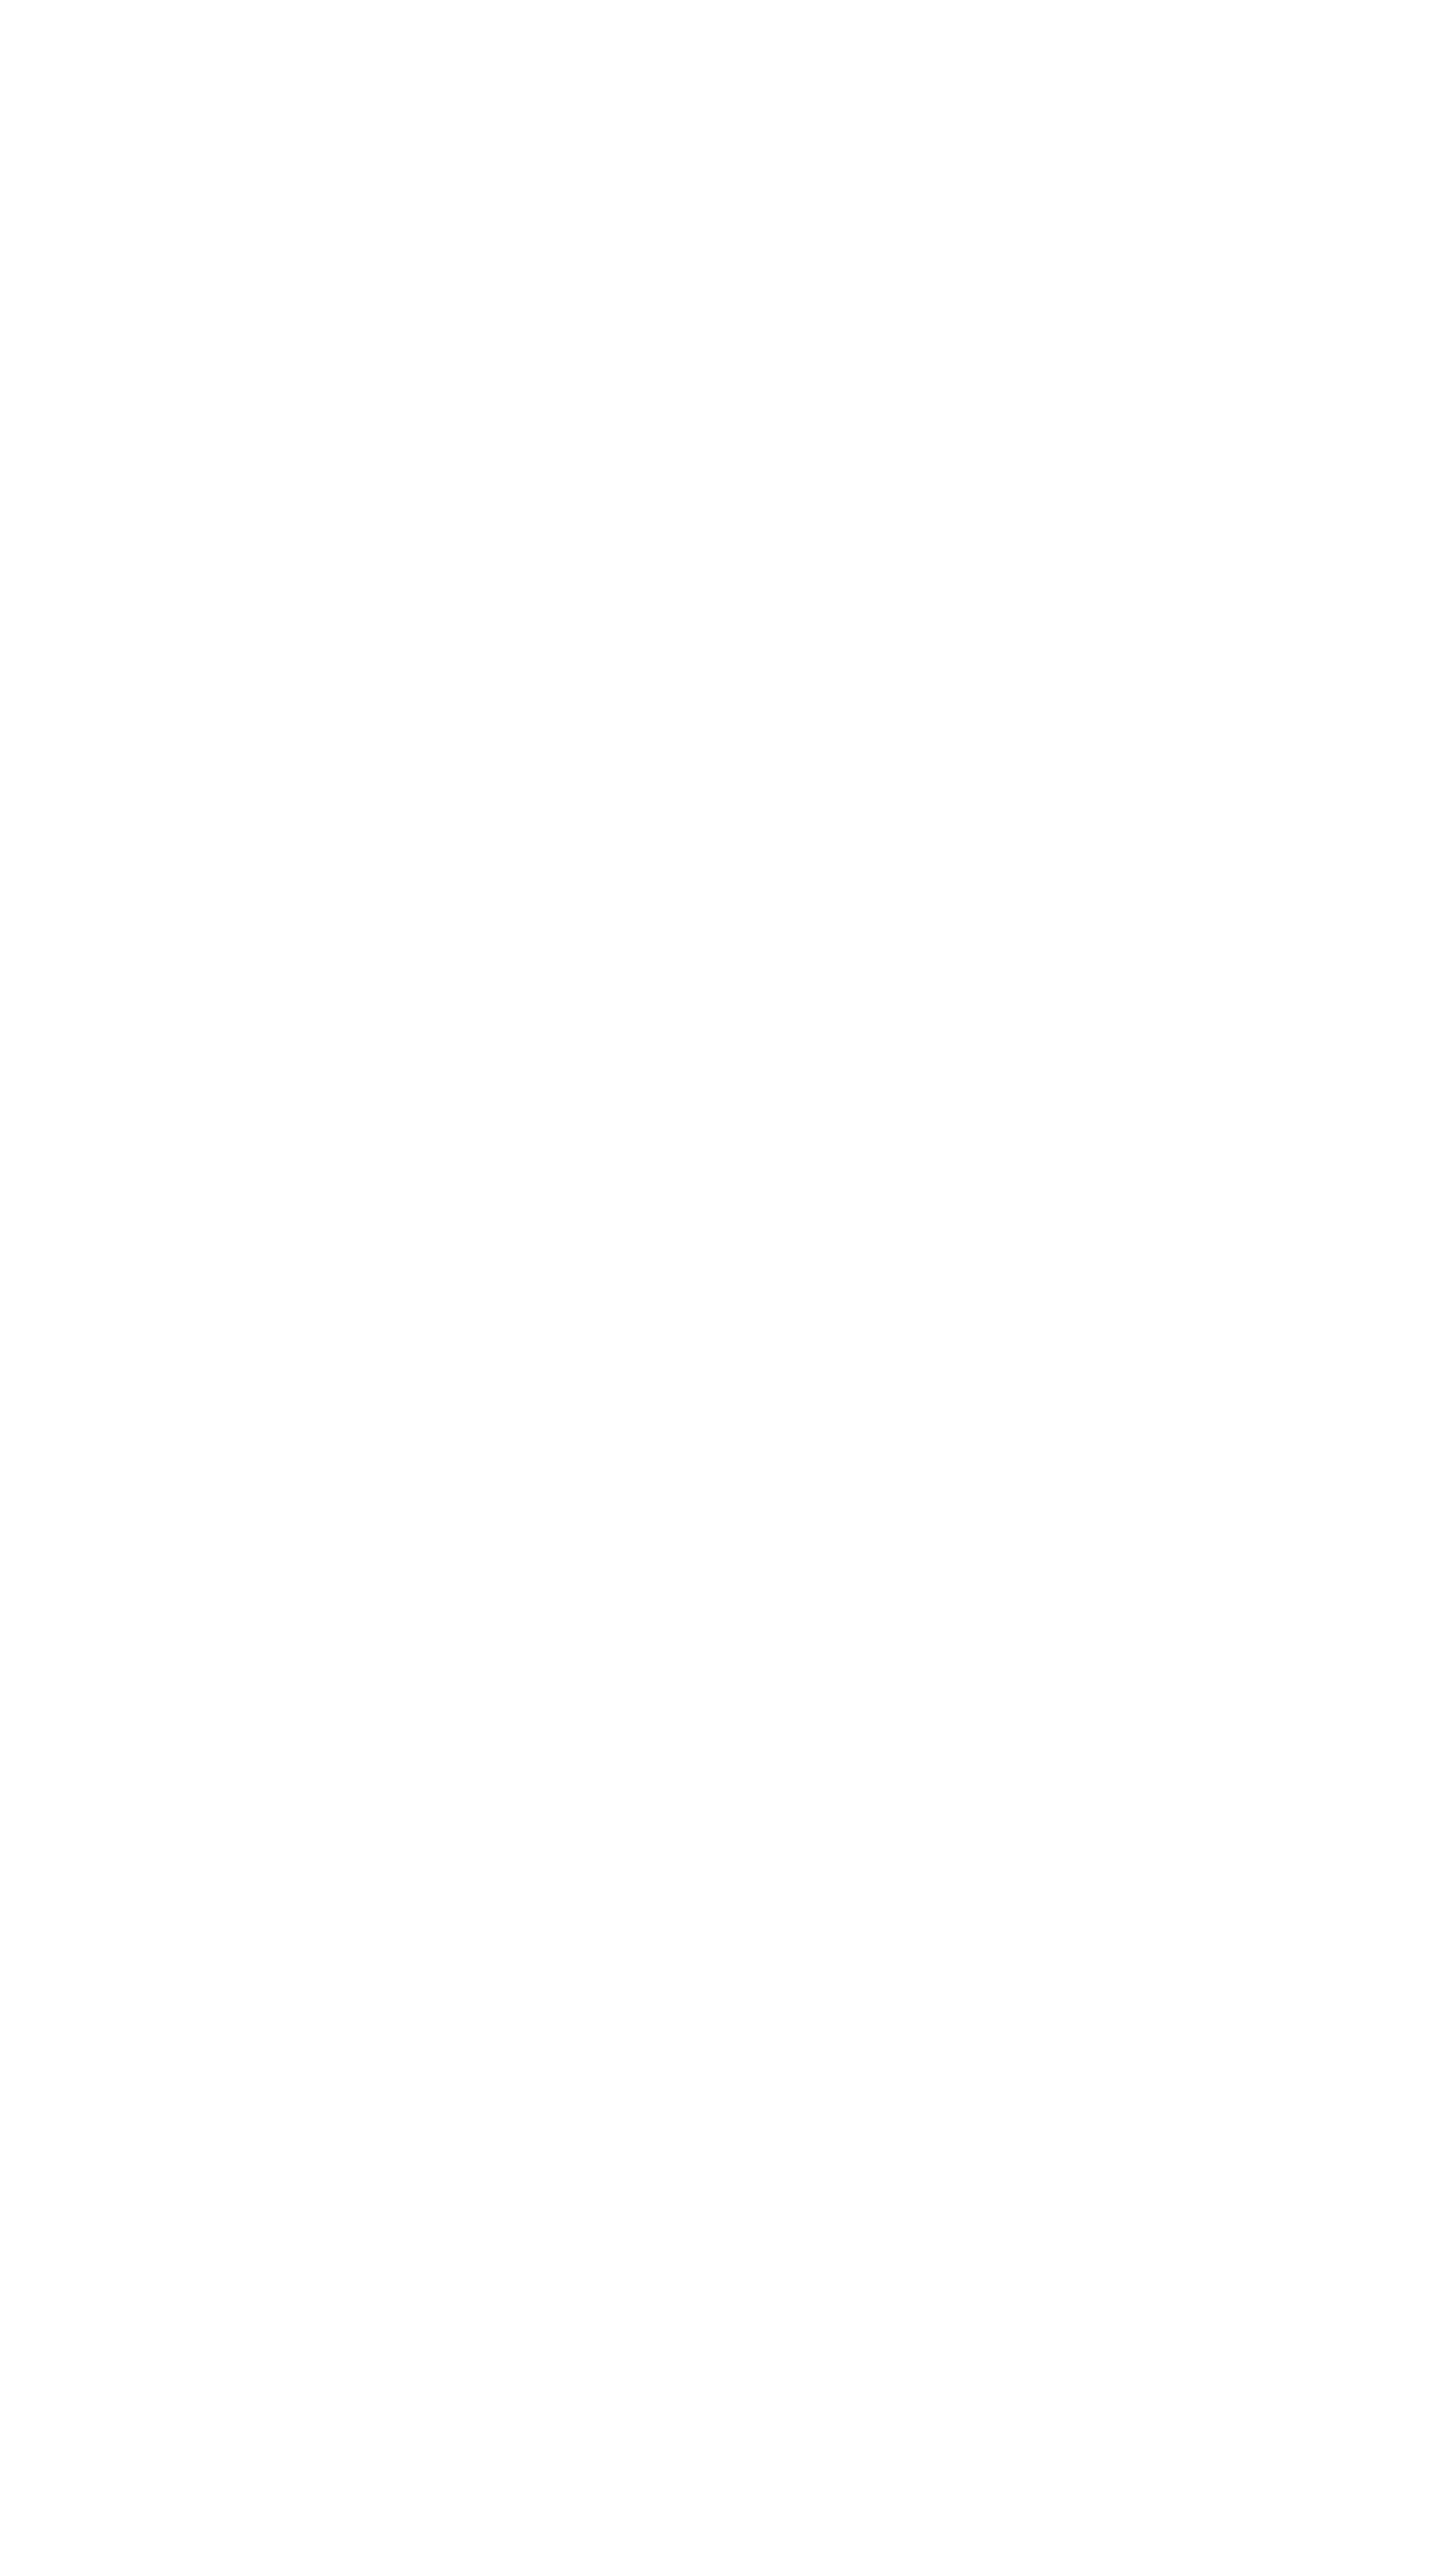 20150424_153718